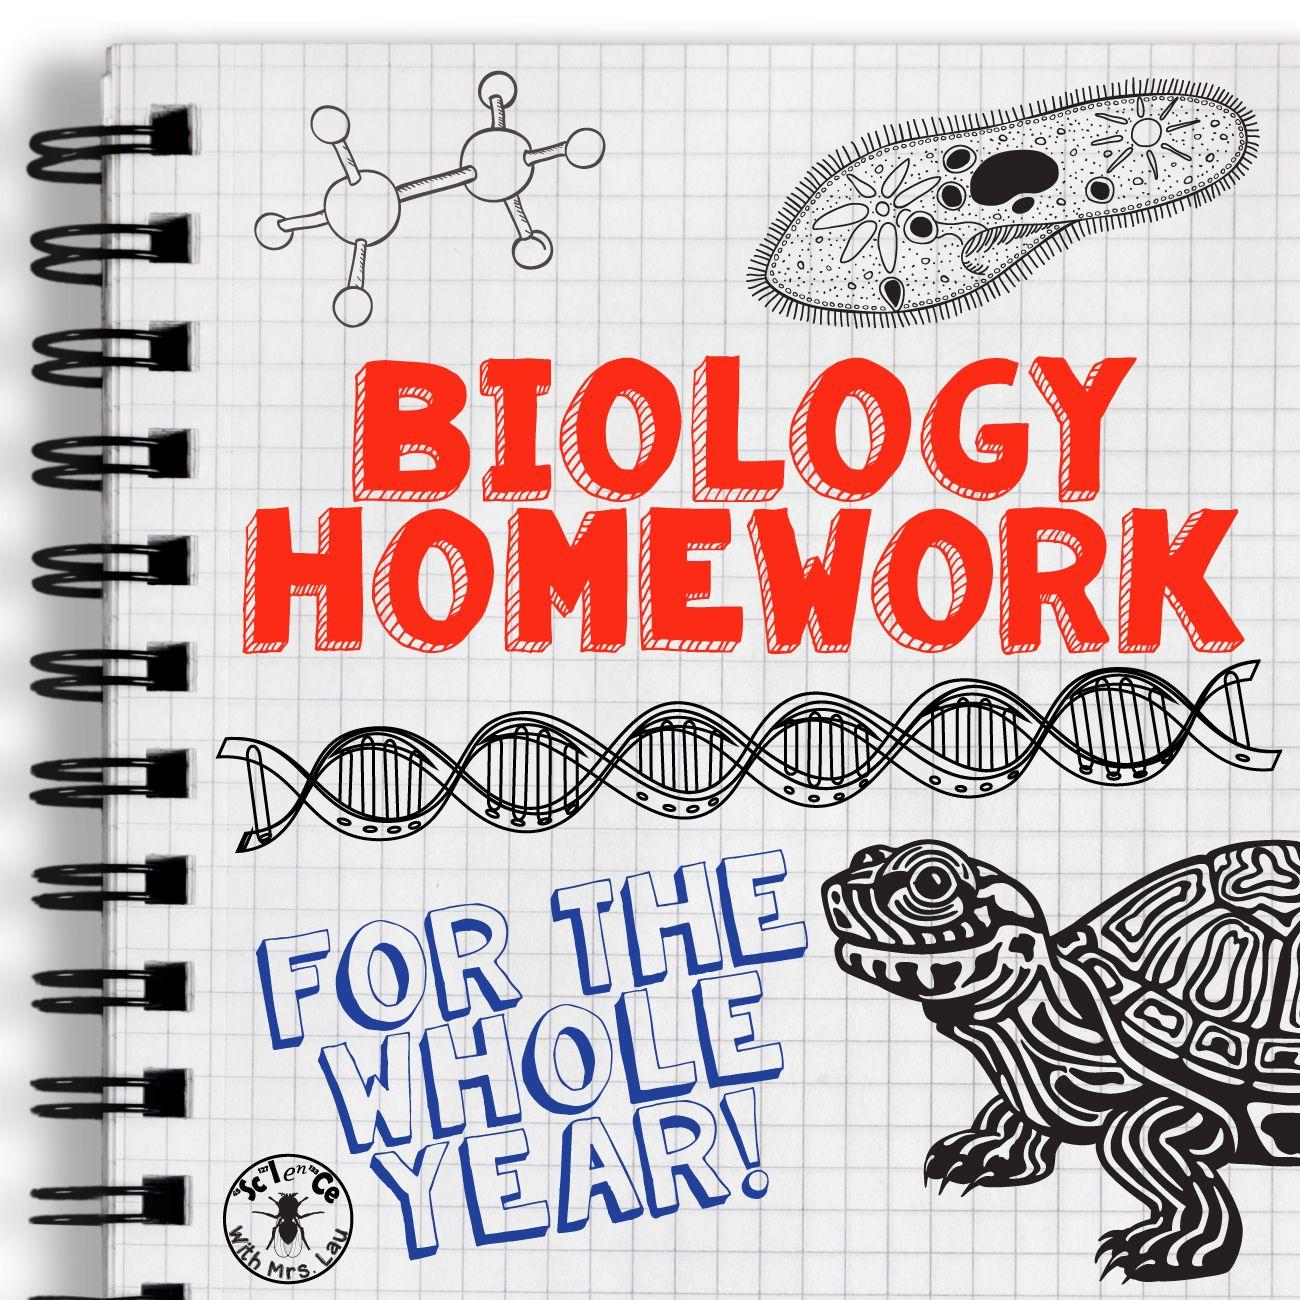 Biology homework page an entrepreneur you admire essay